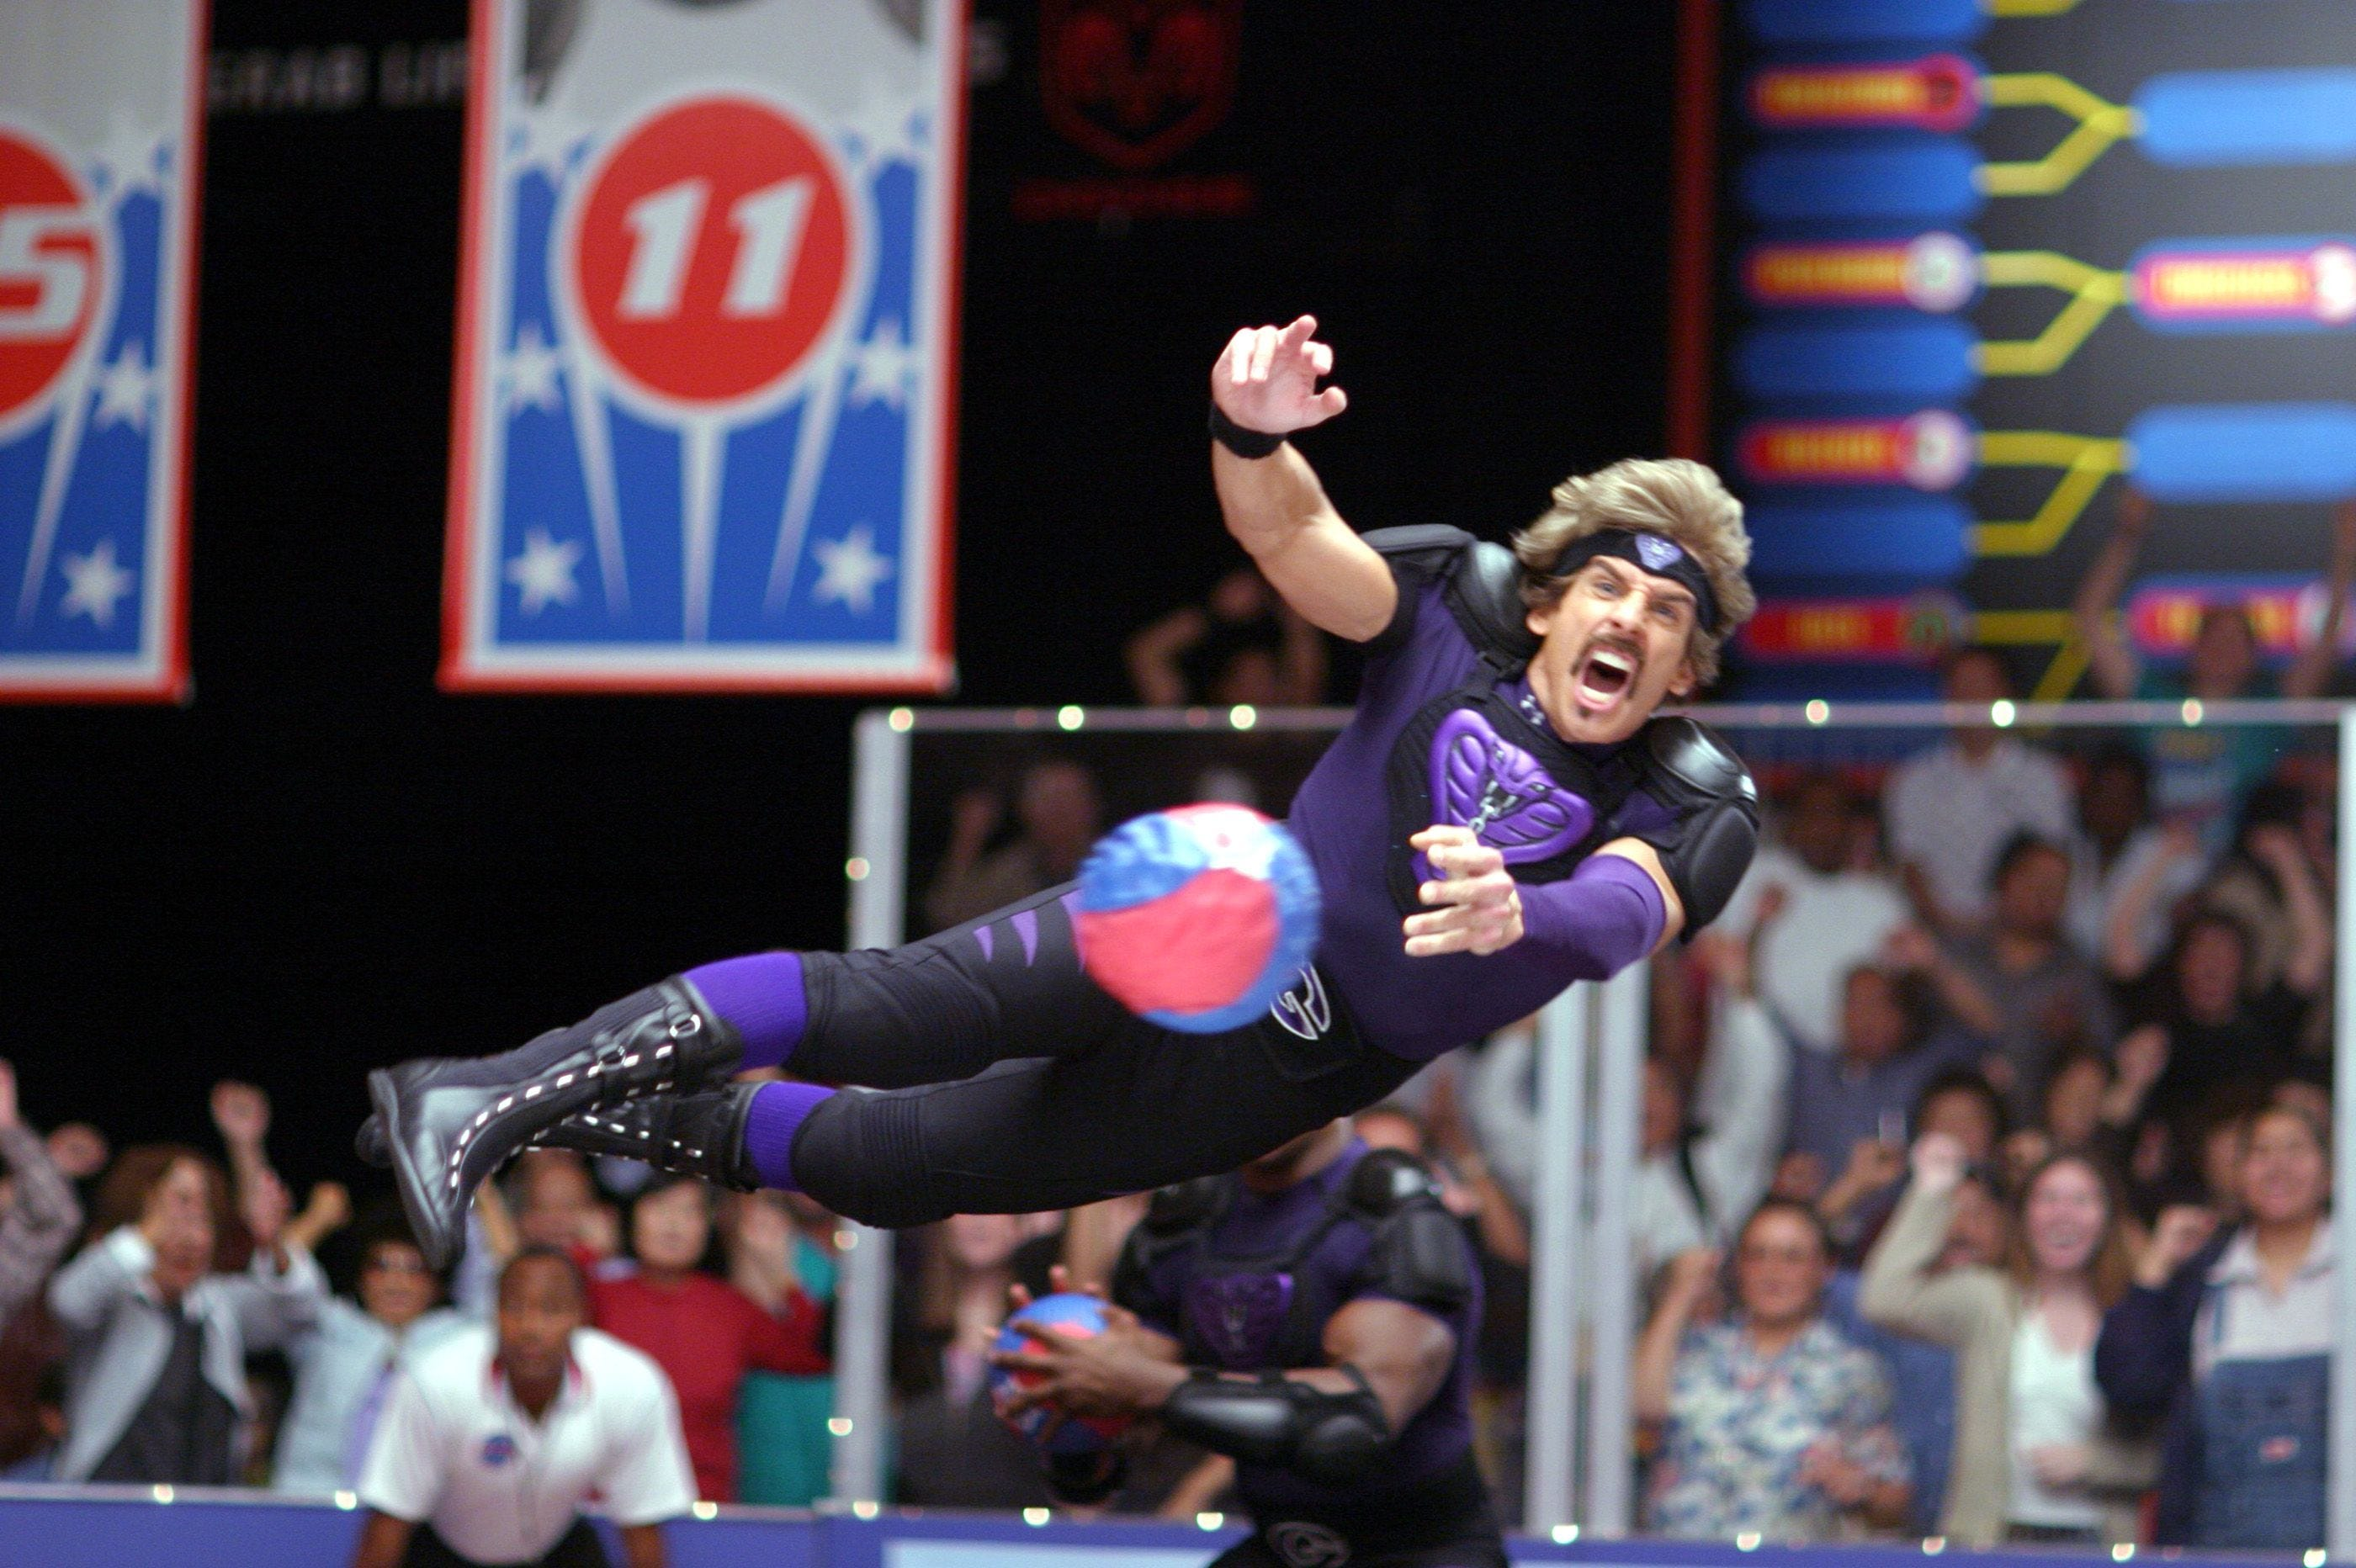 636331153792265987-d08-dodgeball-mov Watch: Ben Stiller reunites the 'Dodgeball' cast